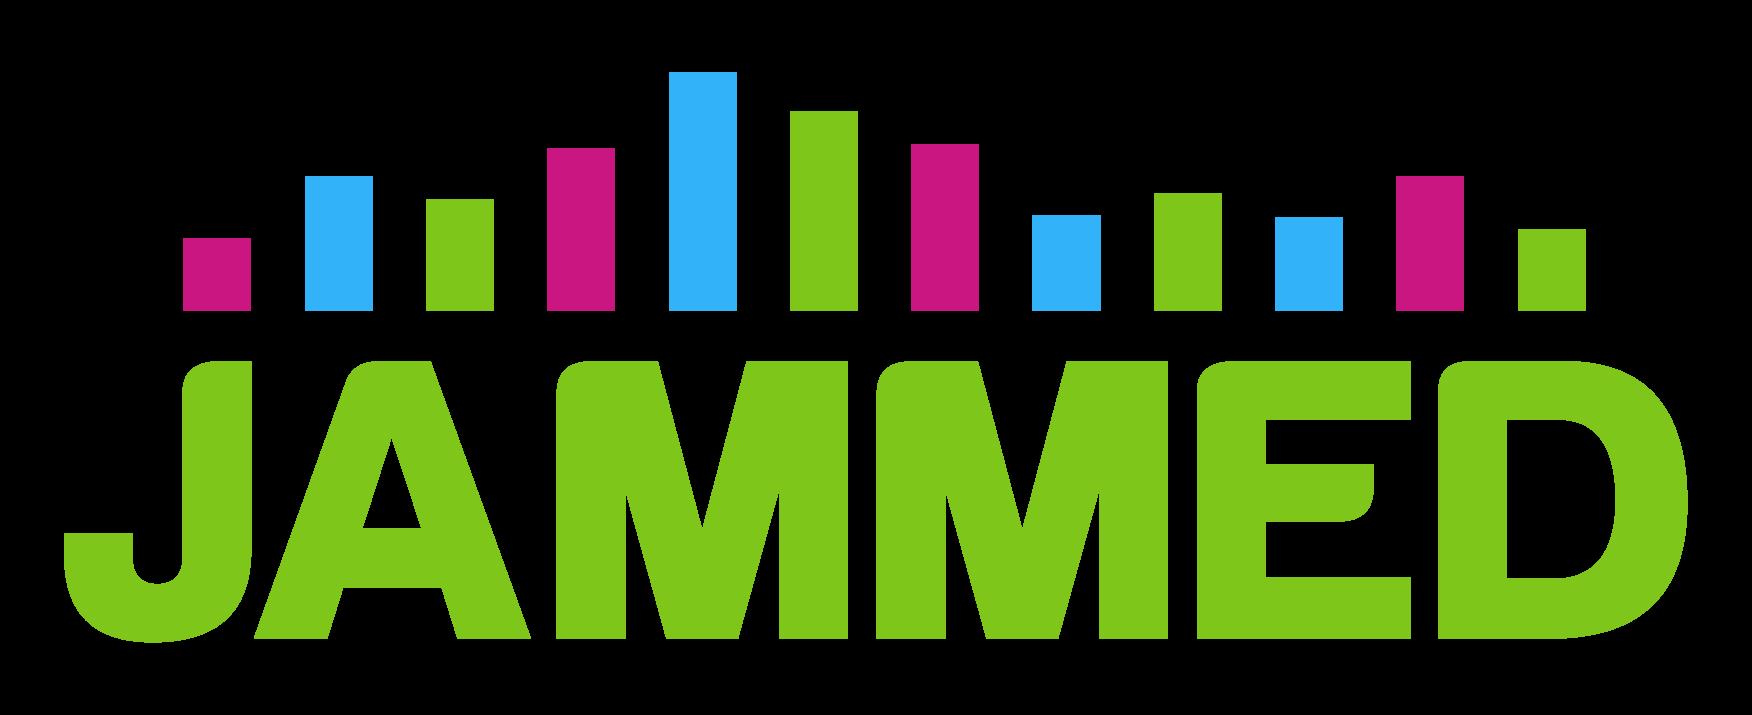 Jammed logo in green